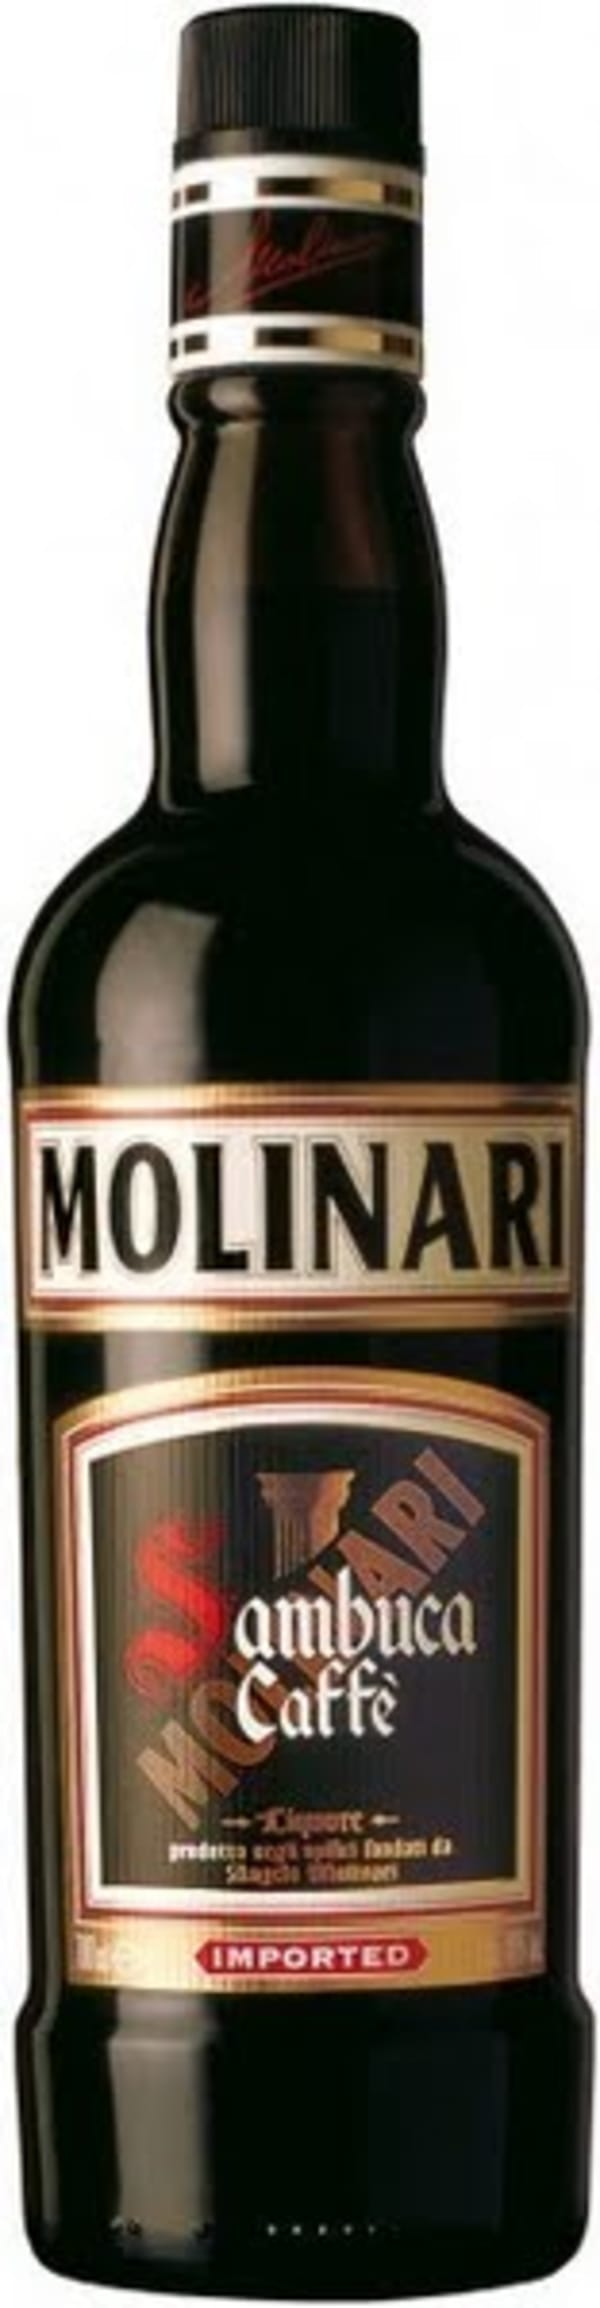 Molinari Sambuca Caffé